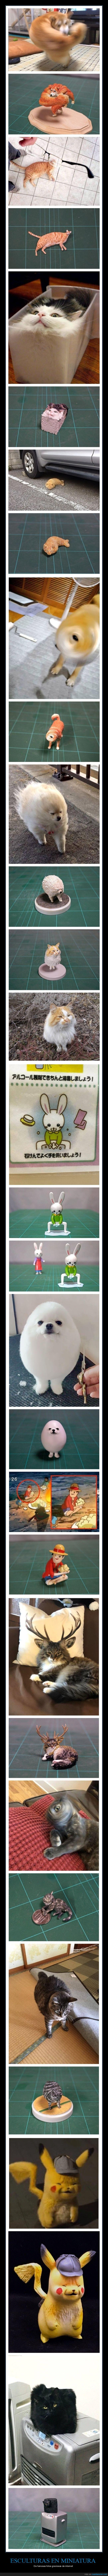 esculturas,fotos graciosas,internet,miniaturas